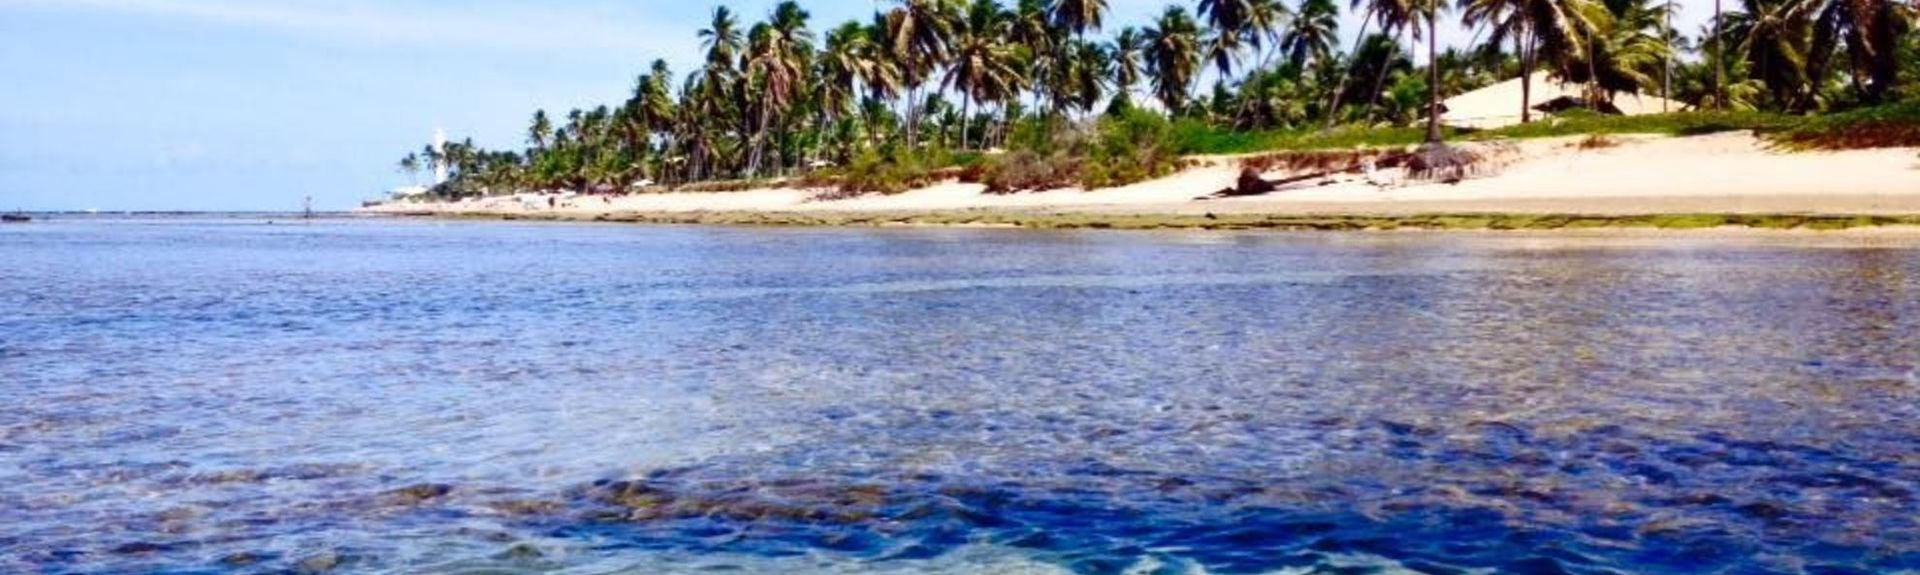 Litoral Norte da Bahia, State of Bahia, Brazil